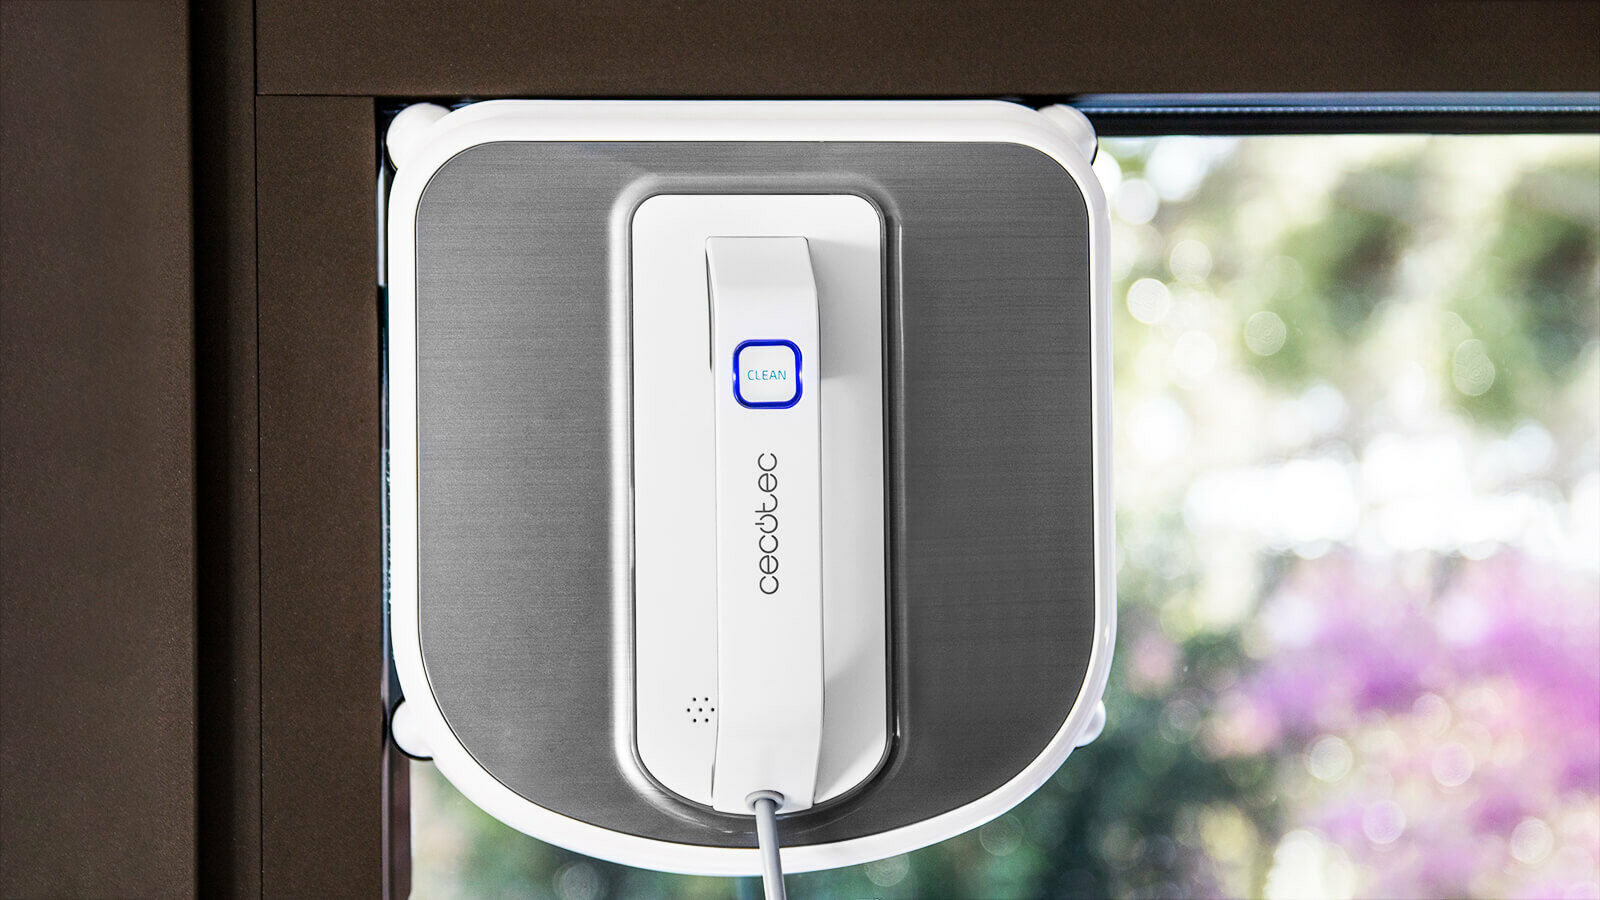 CECOTEC Robot limpiacristales Conga Winrobot Excellence   iTech 2.0   4 modos